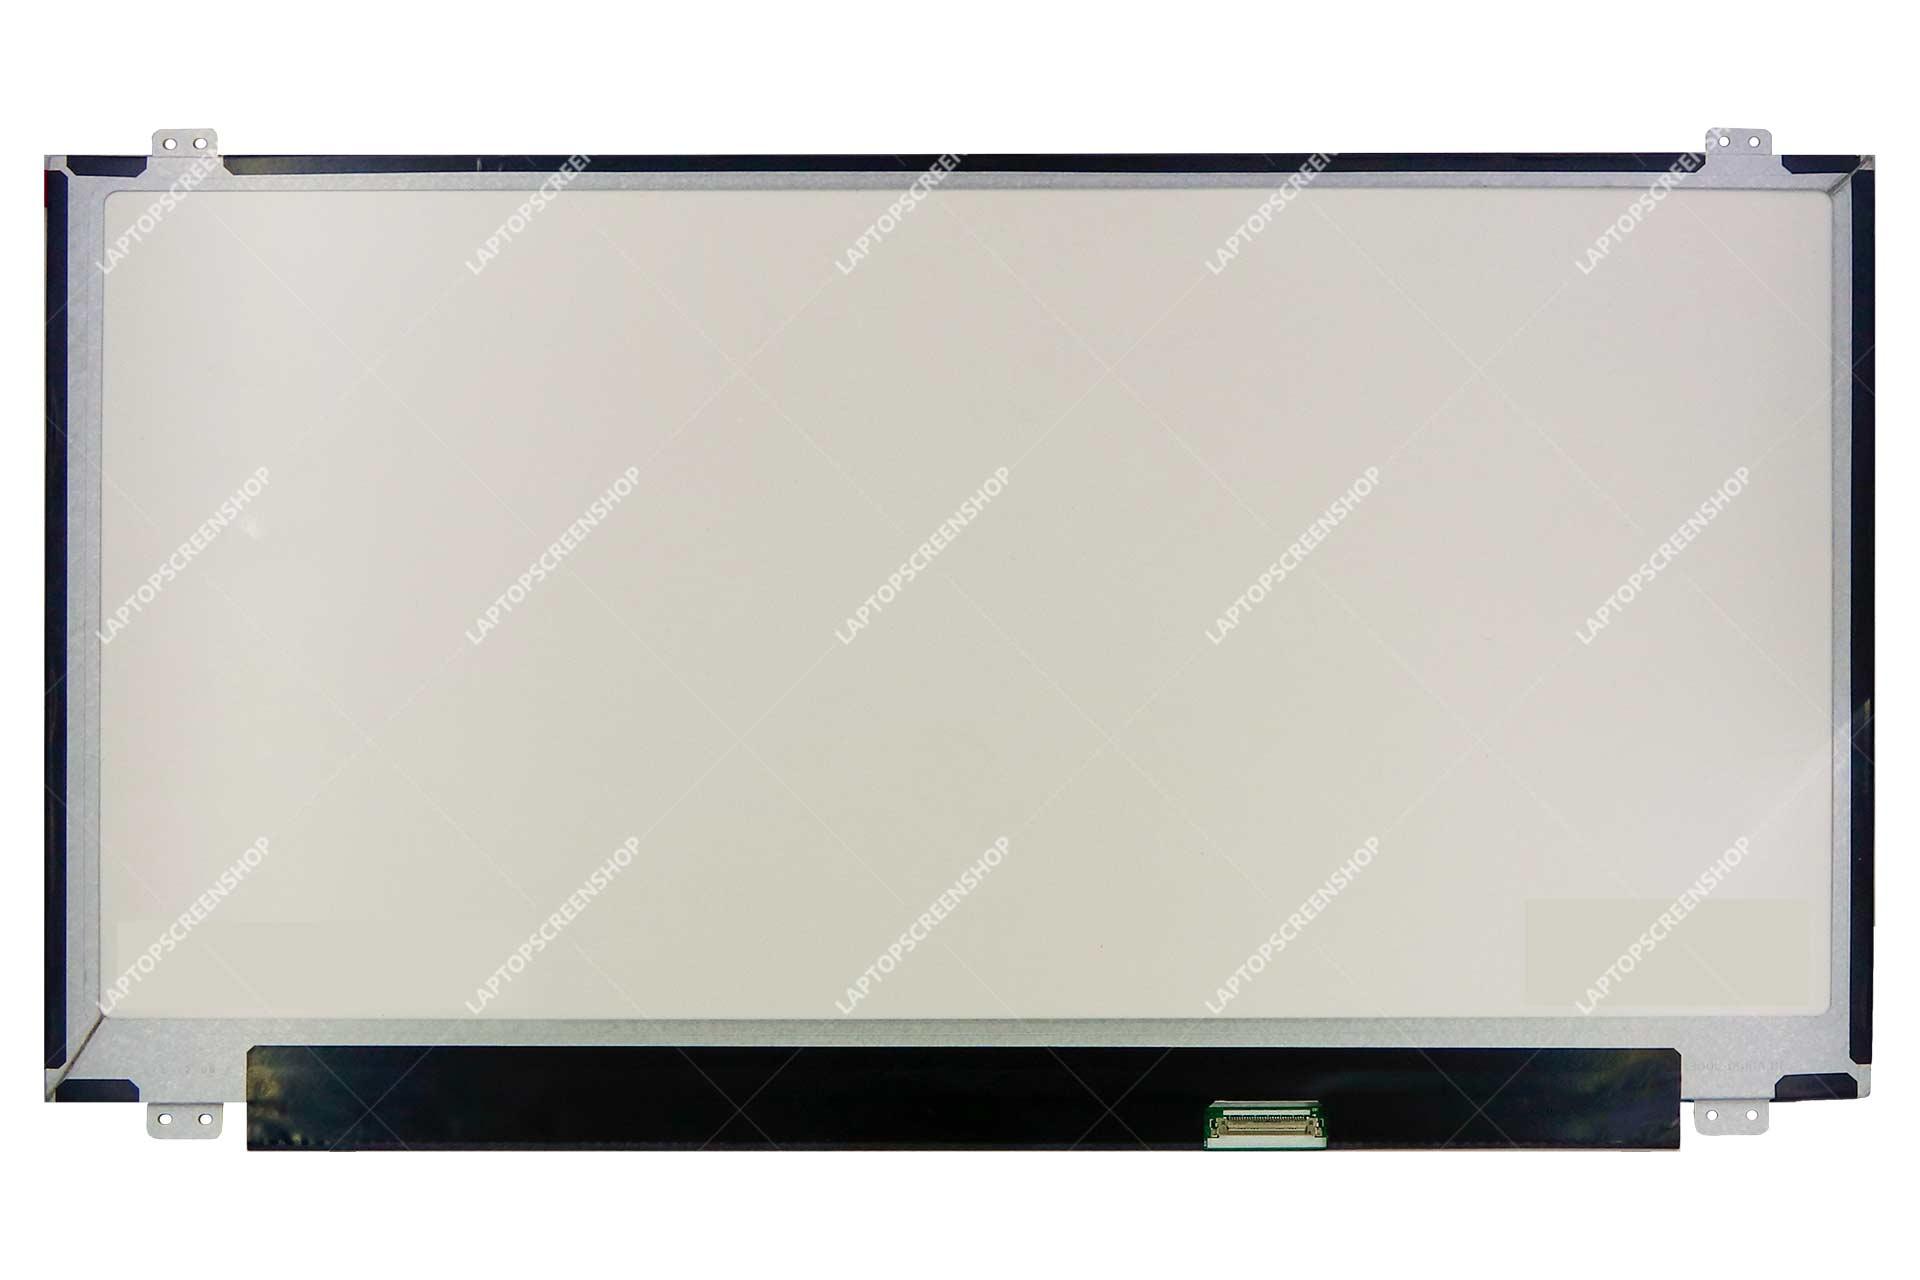 ACER-ASPIRE-E1-570-6417-LCD |HD|فروشگاه لپ تاپ اسکرين | تعمير لپ تاپ